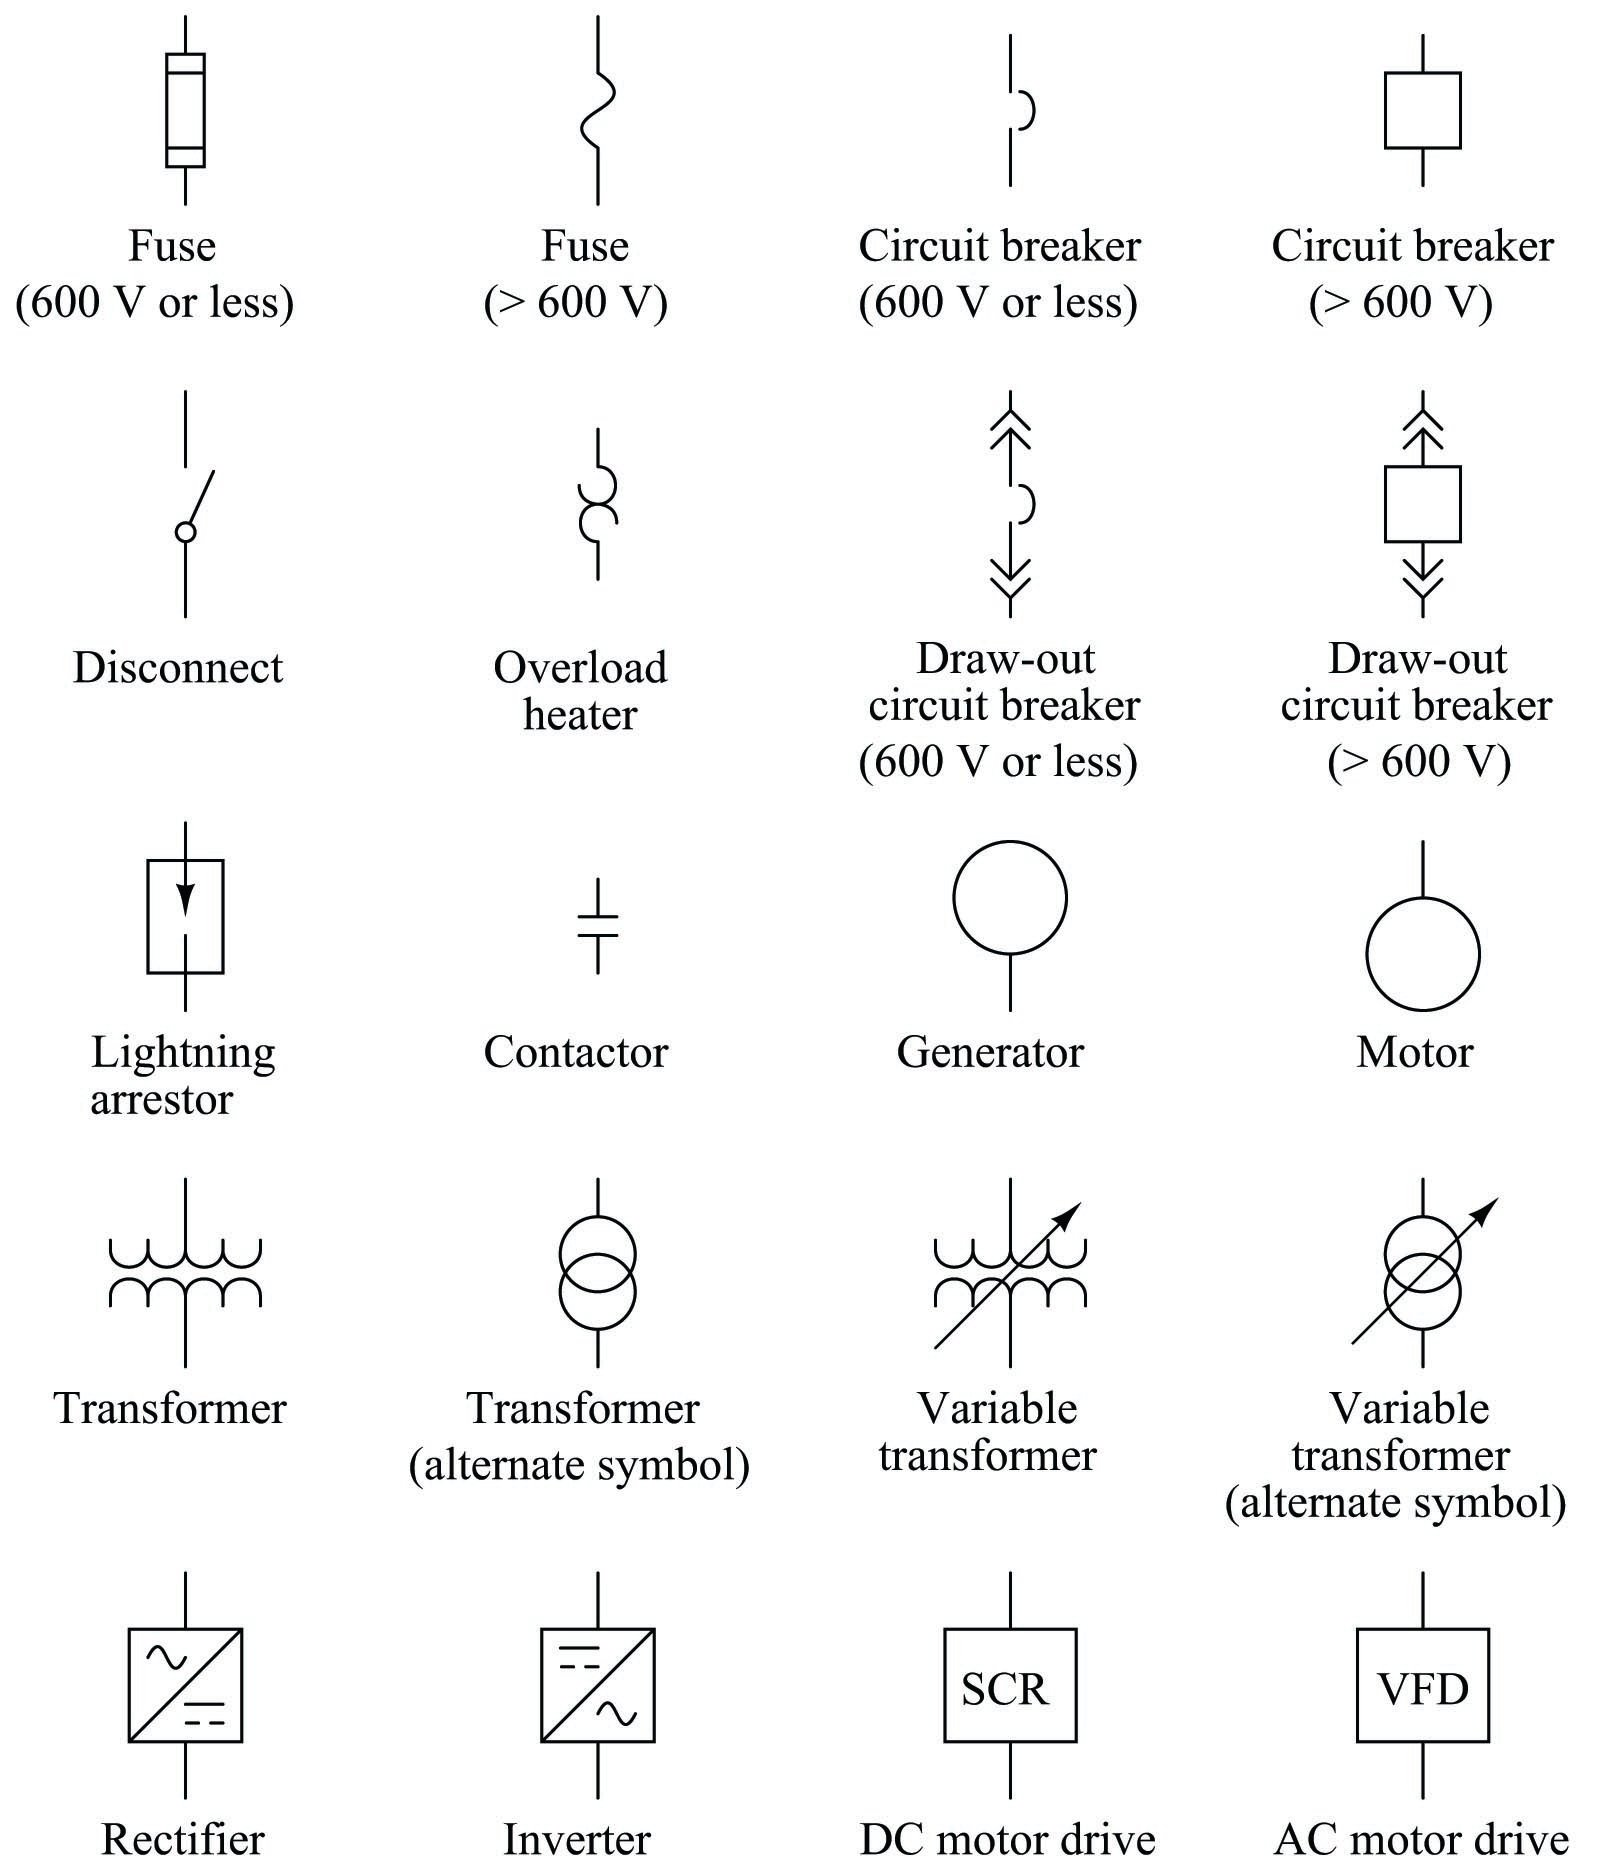 Instrument And Process Equipment Symbols